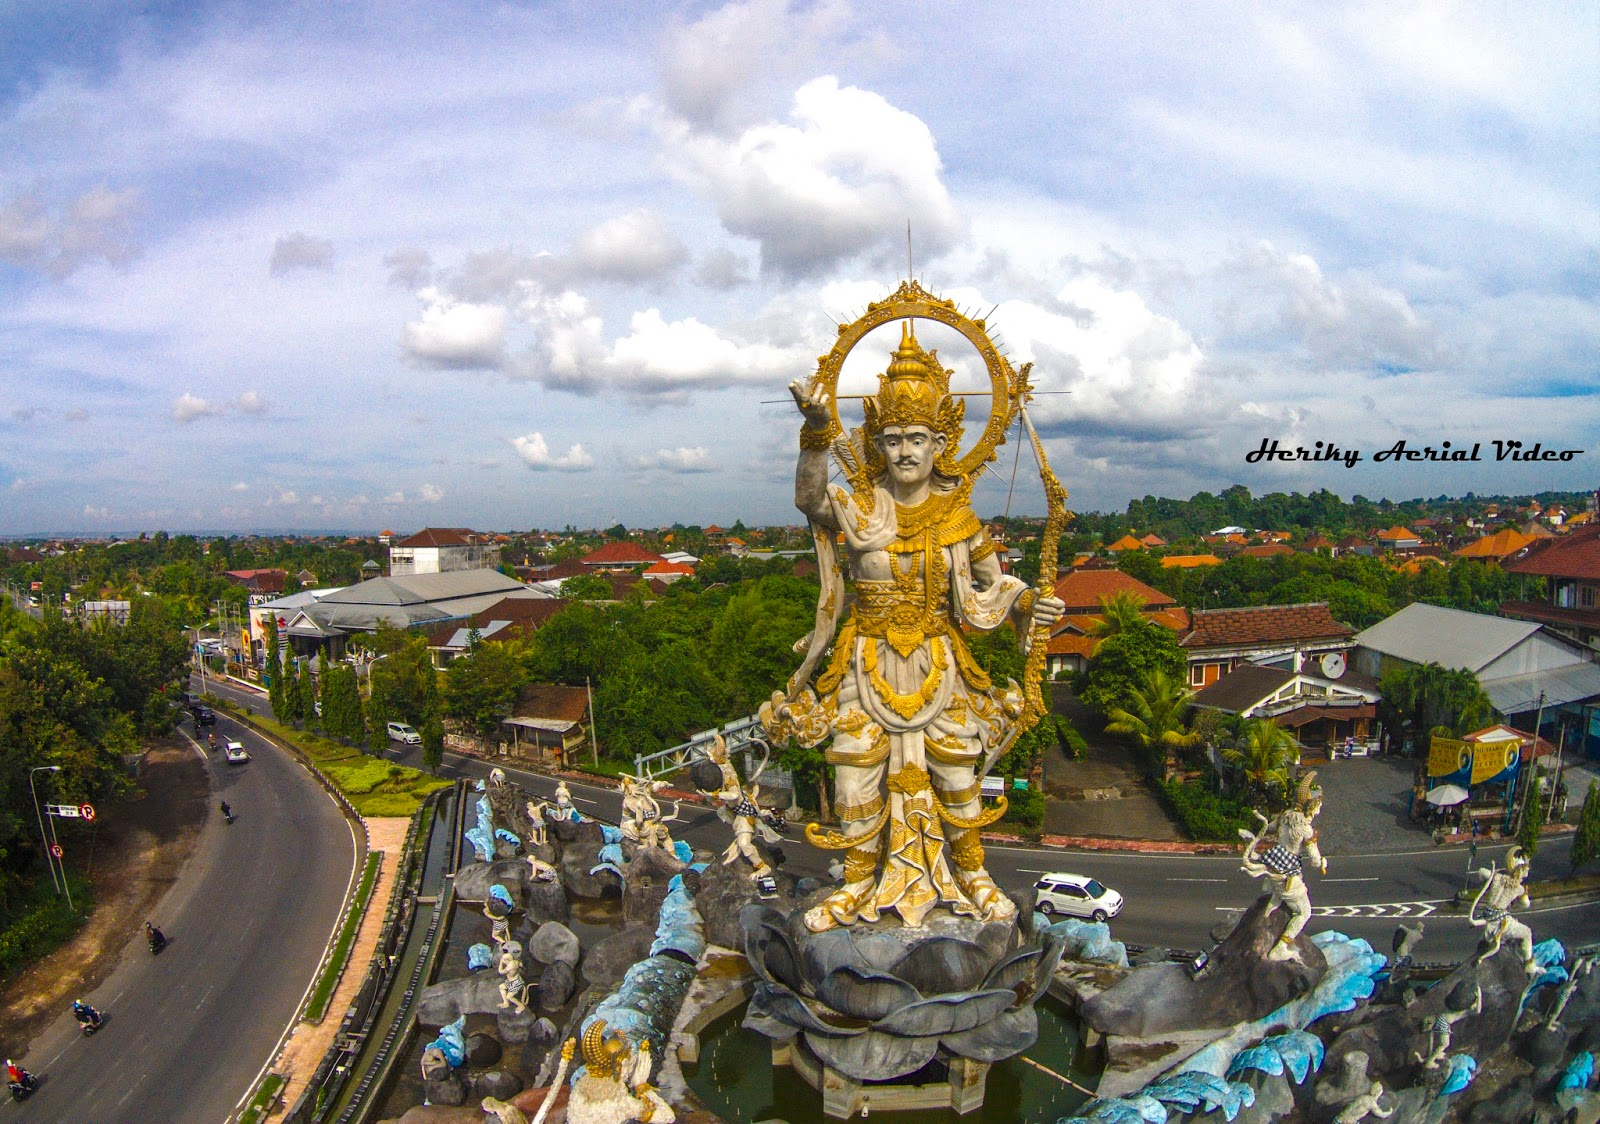 Jasa Video Foto Aerial Ikon Kota Denpasar Patung Titi Banda